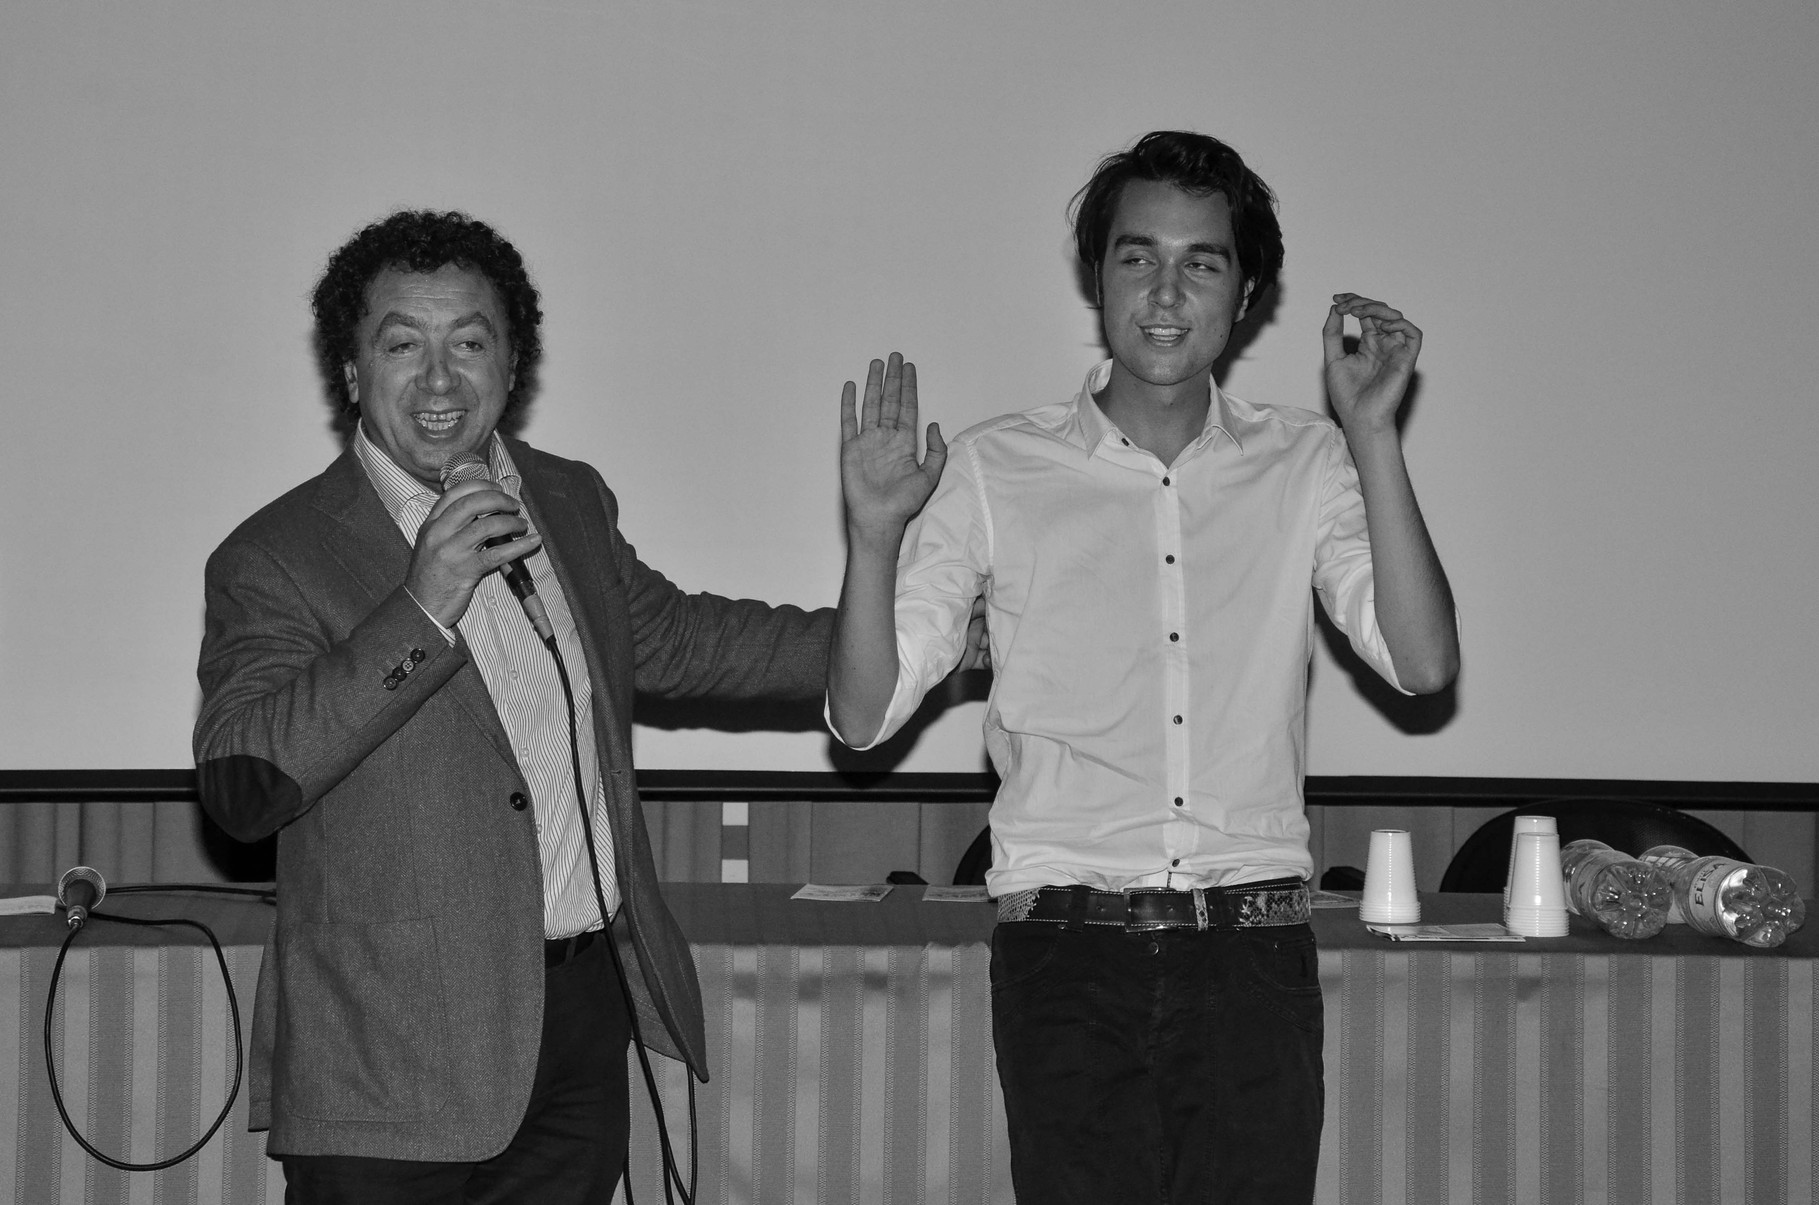 Marcello Zeppi (Presidente MISFF), Massimo de Matteis (regista)